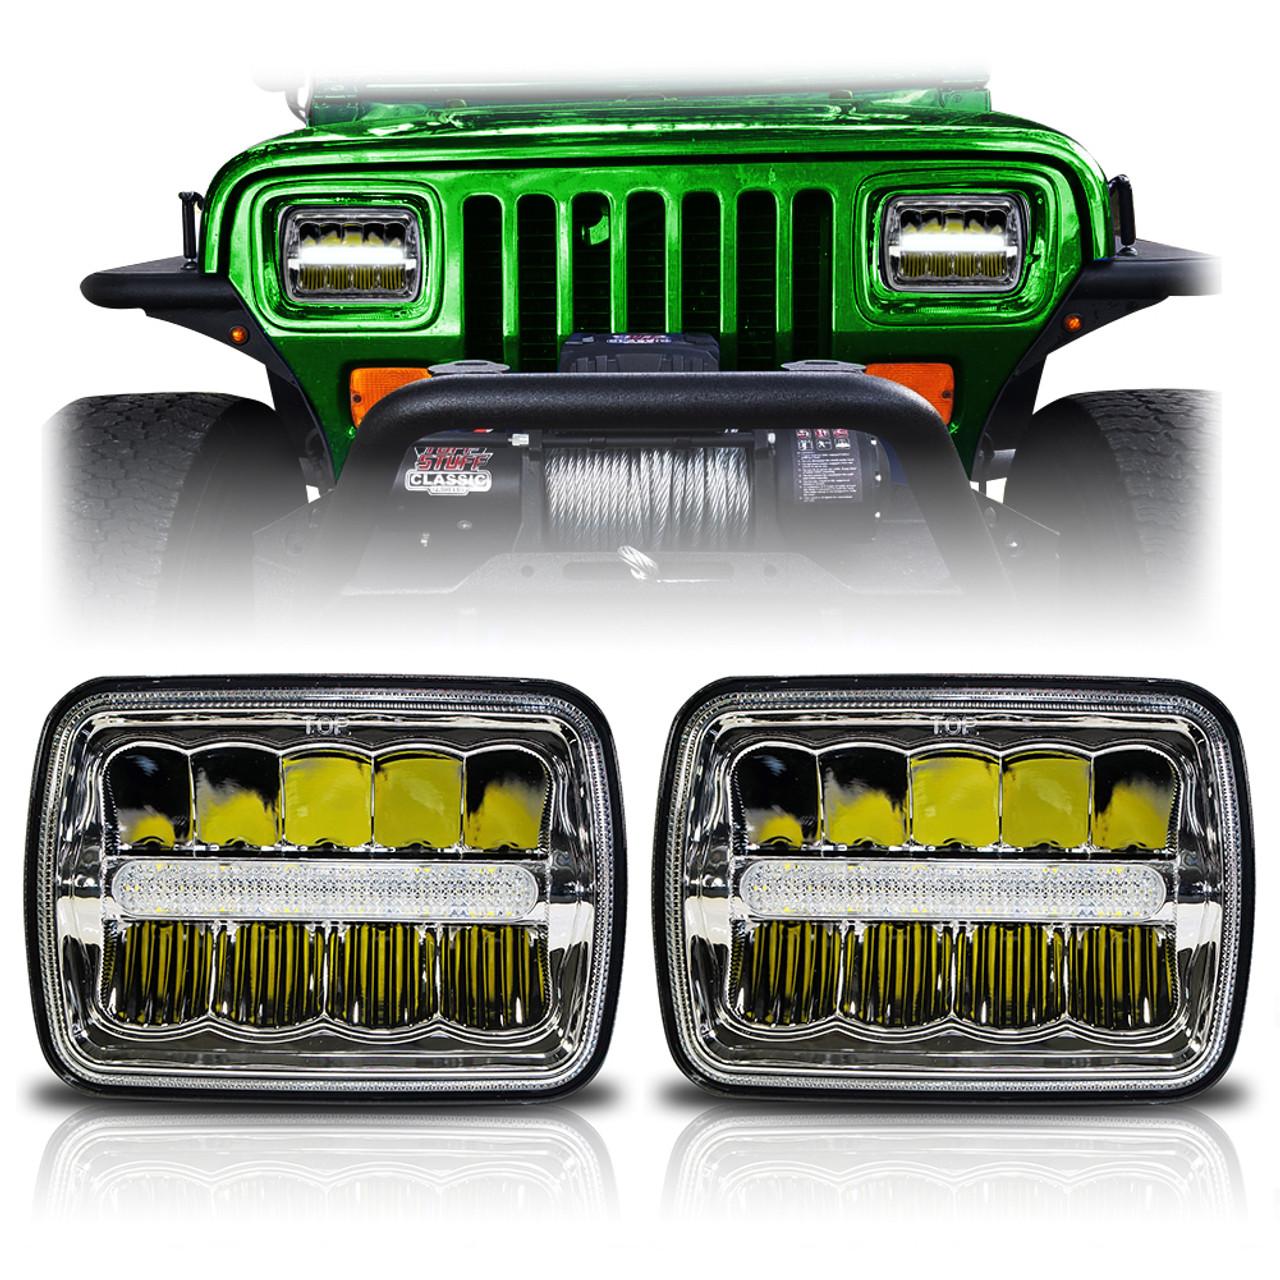 xdr led chrome headlights w/drl for xj and yj - jeepfederation 2001 jeep xj fuse diagram jeep xj halo headlights wiring